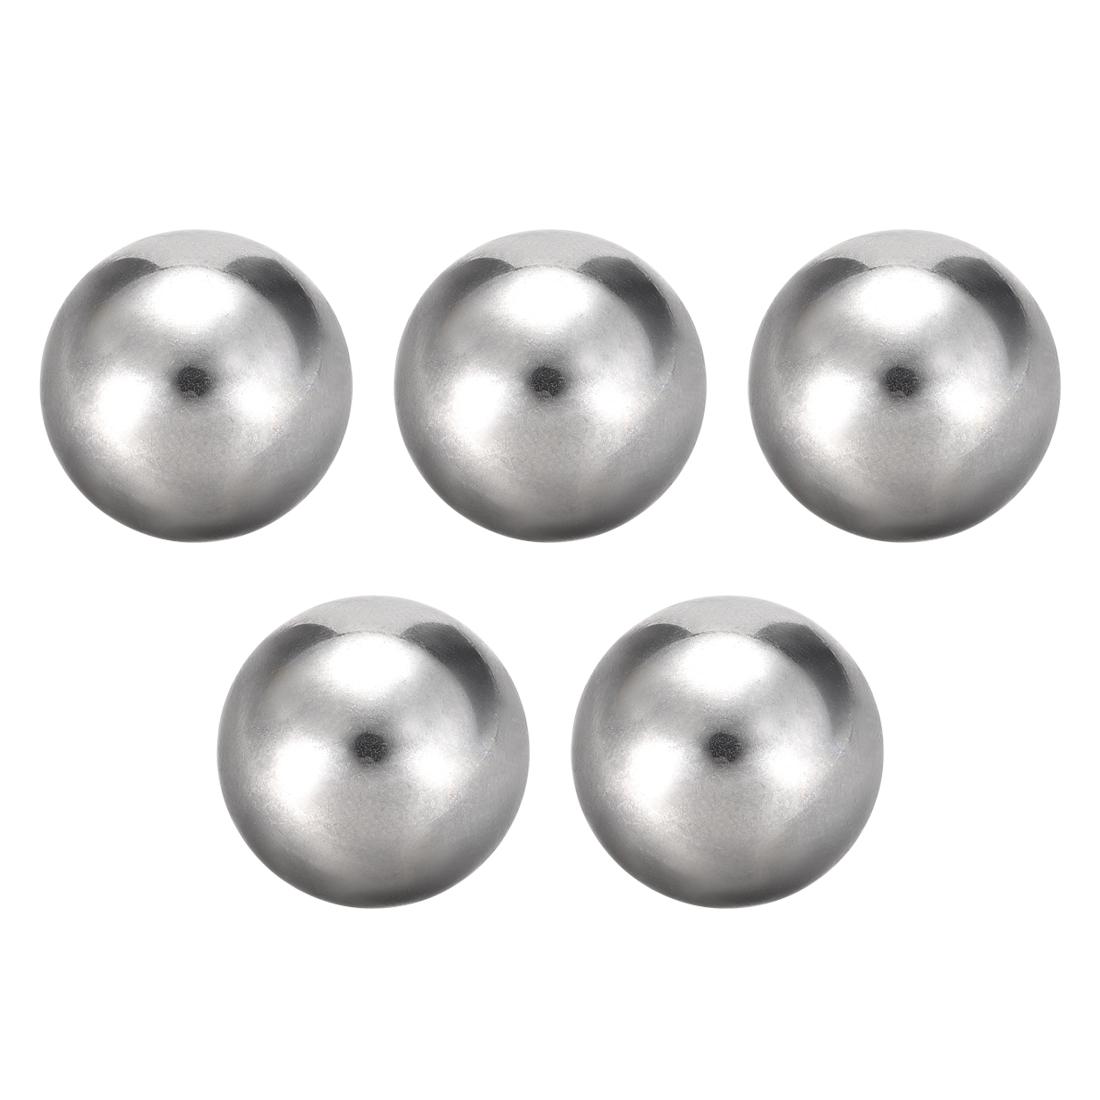 Precision Chrome Steel Bearing Balls 18mm G10 5pcs